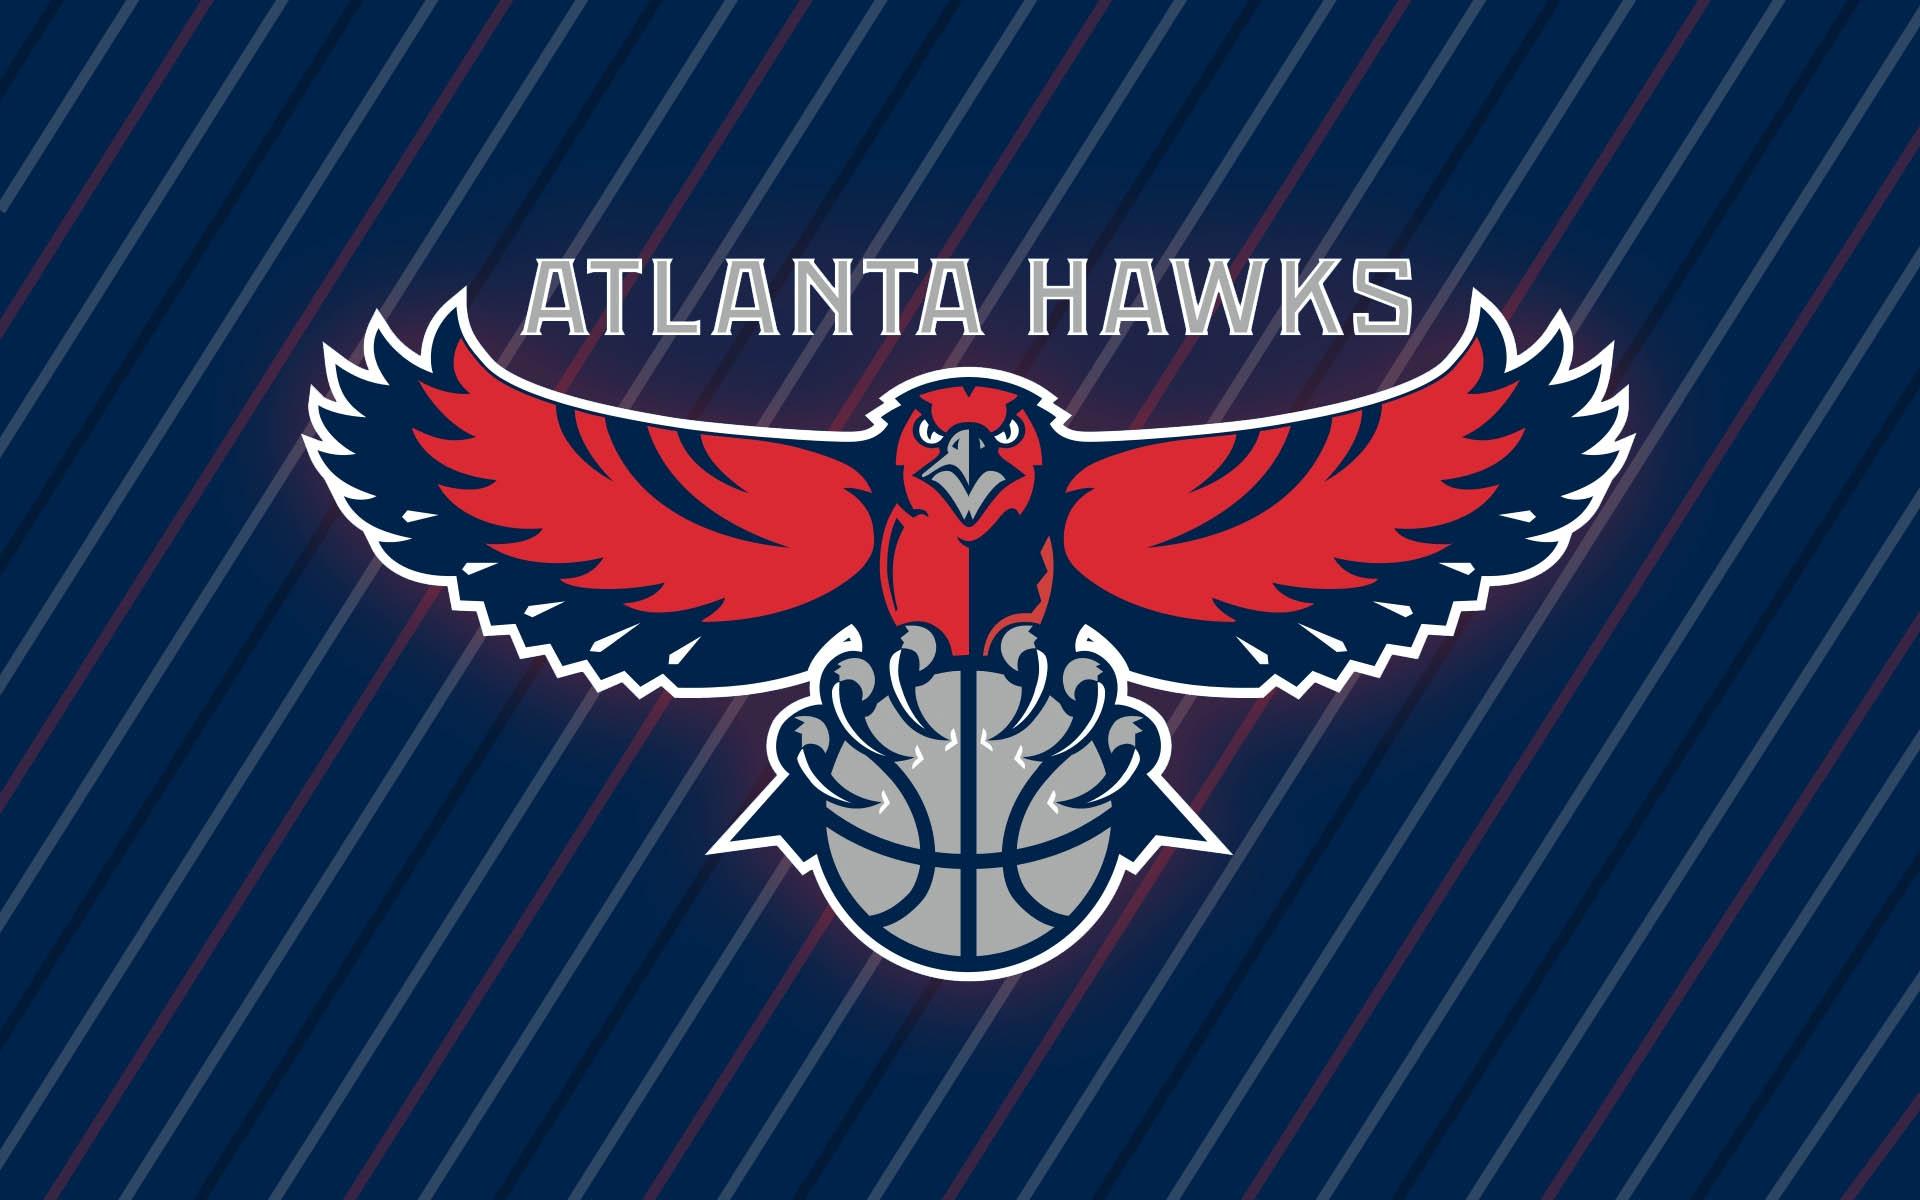 Atlanta Hawks Wallpaper 1920x1200